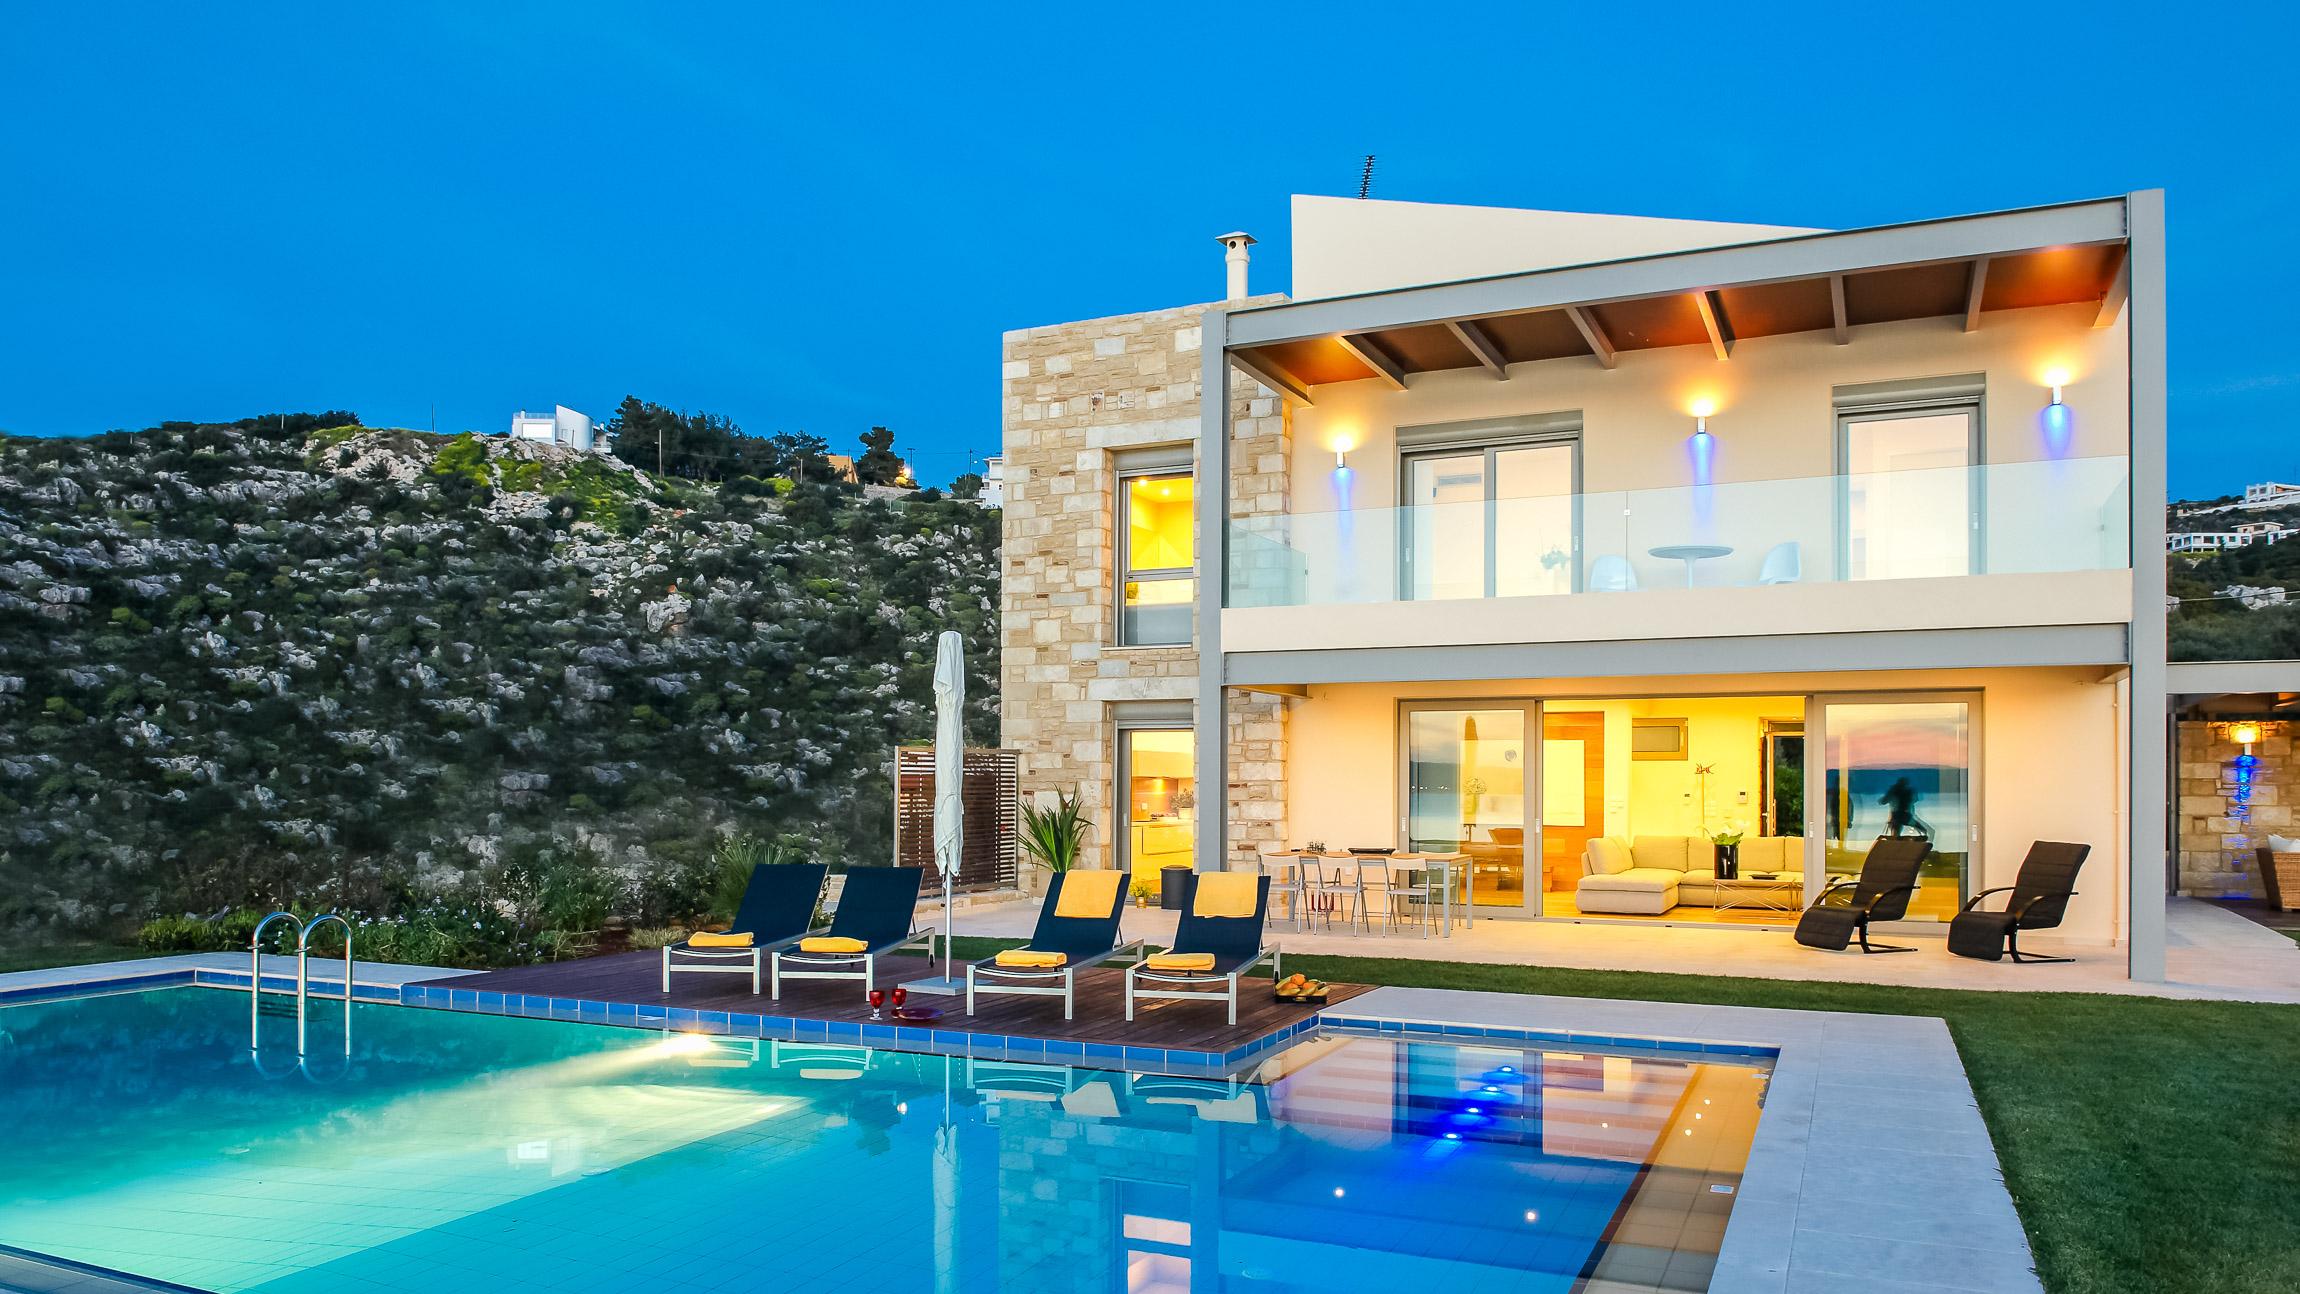 Almyra - Chania, Crete, Greece